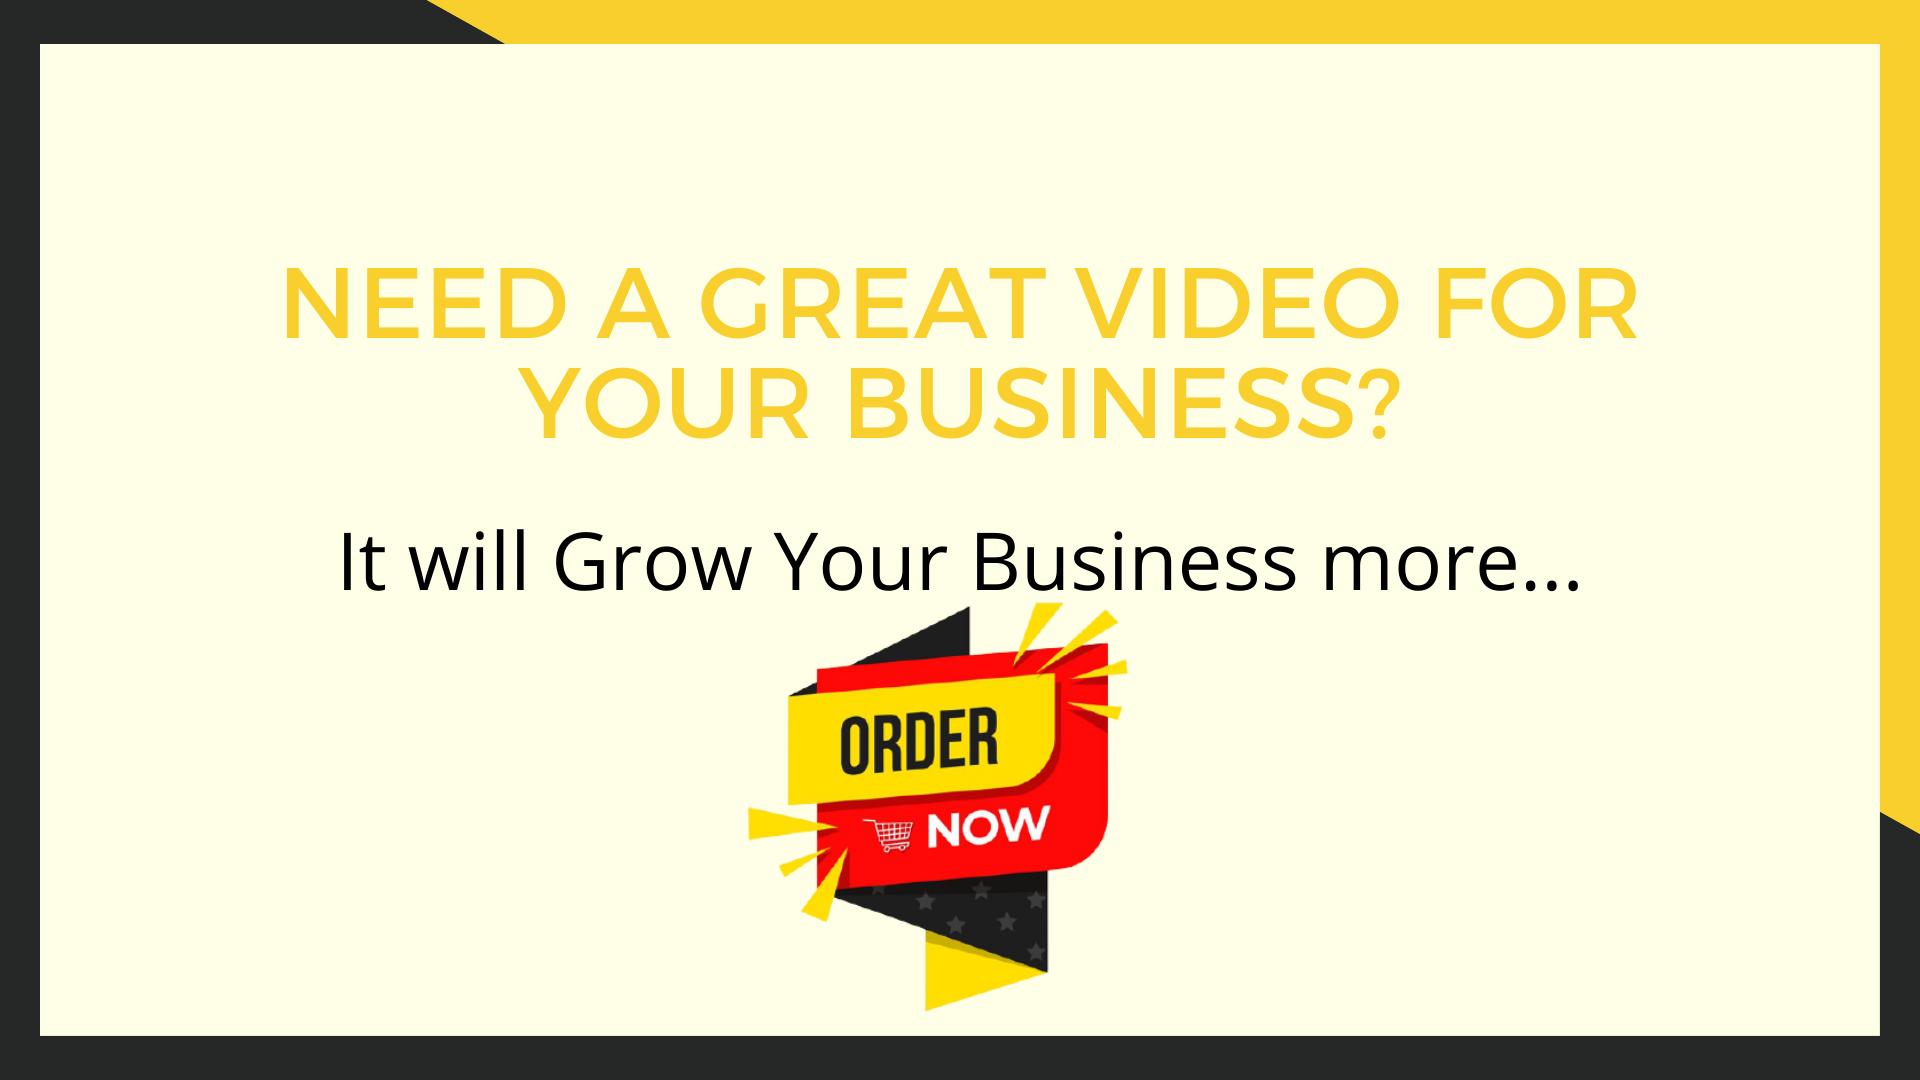 I will do short video ads for facebook,  instagram,  and social media